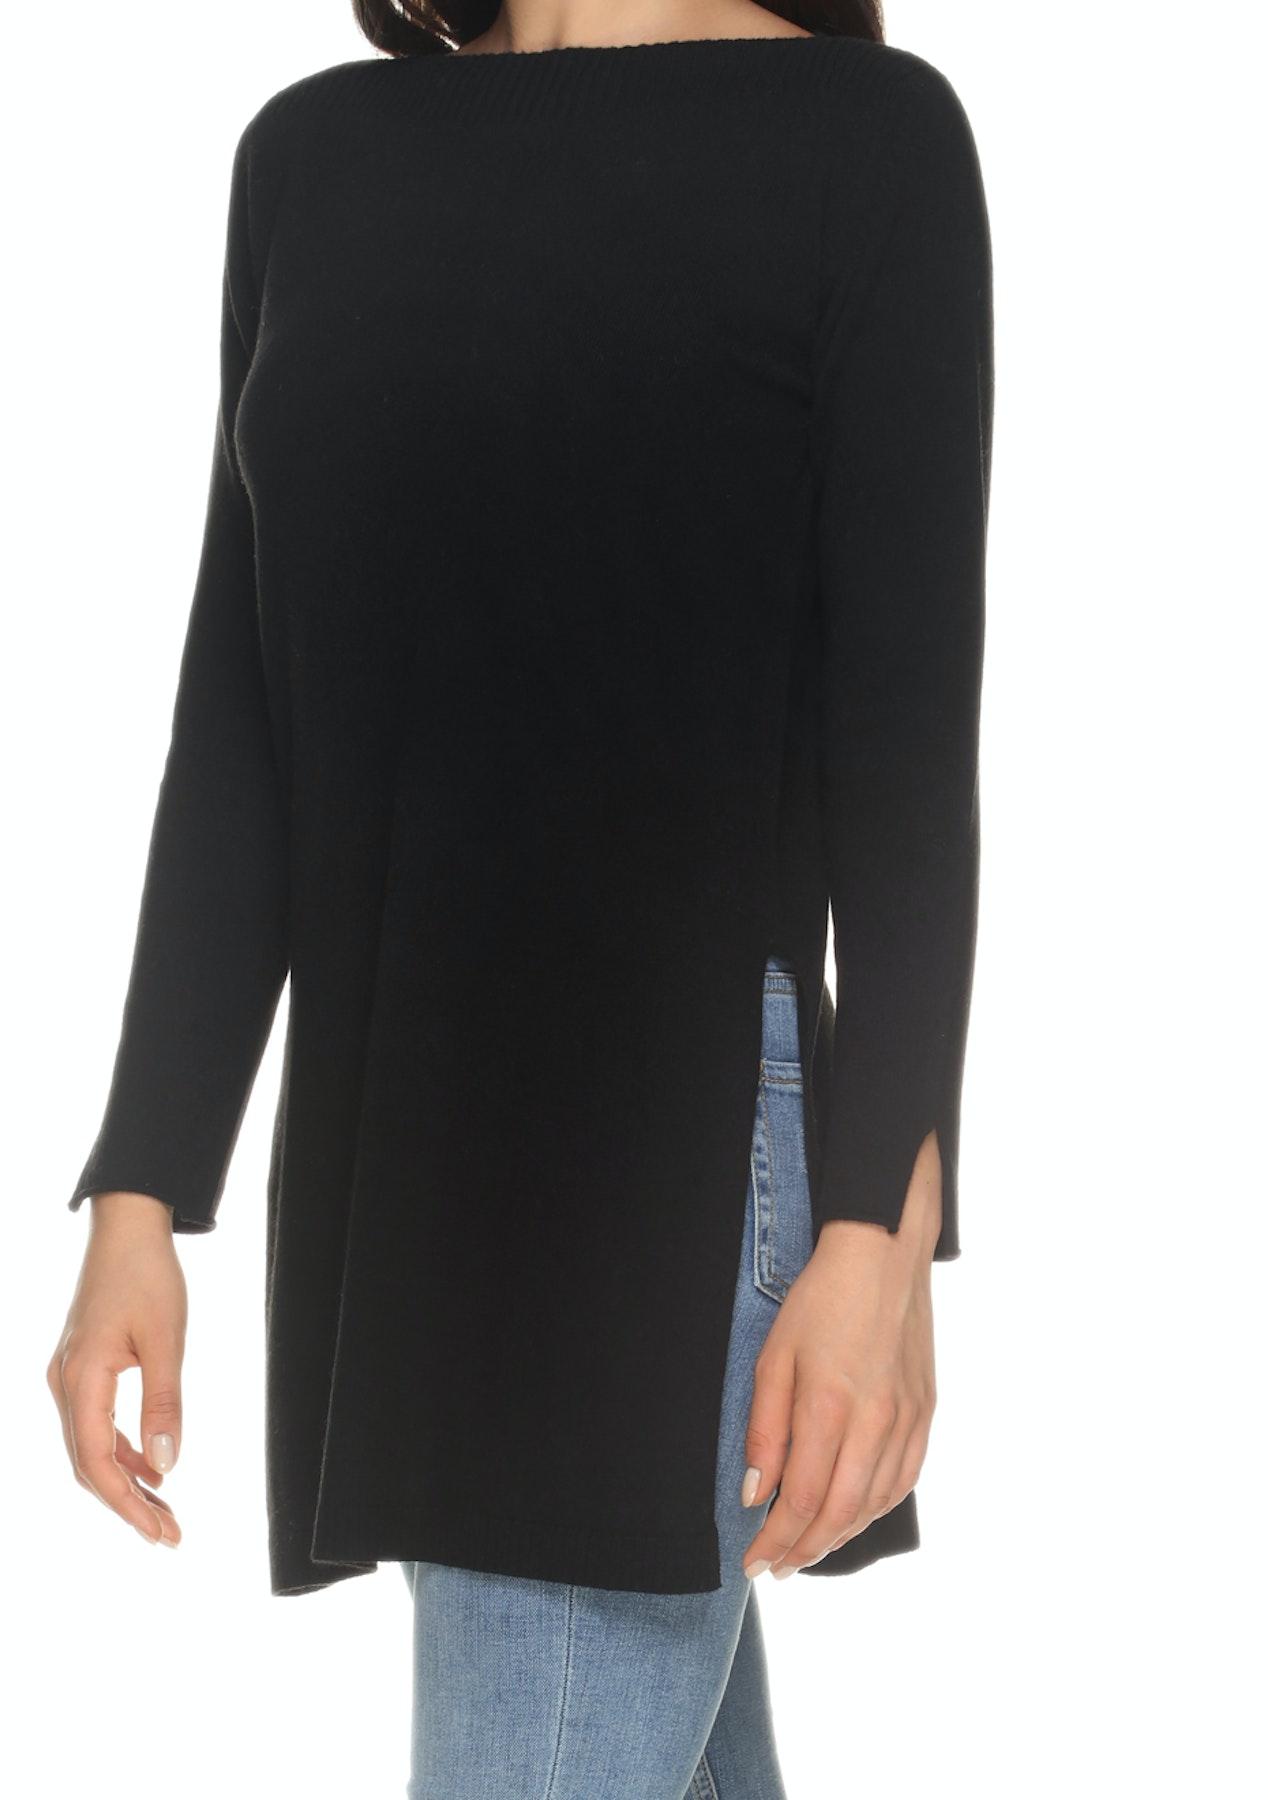 ec514e0cd04 Love Cashmere - Tunic - Black - Back by Popular Demand Cashmere/Merino  Blends Under $120 - Onceit